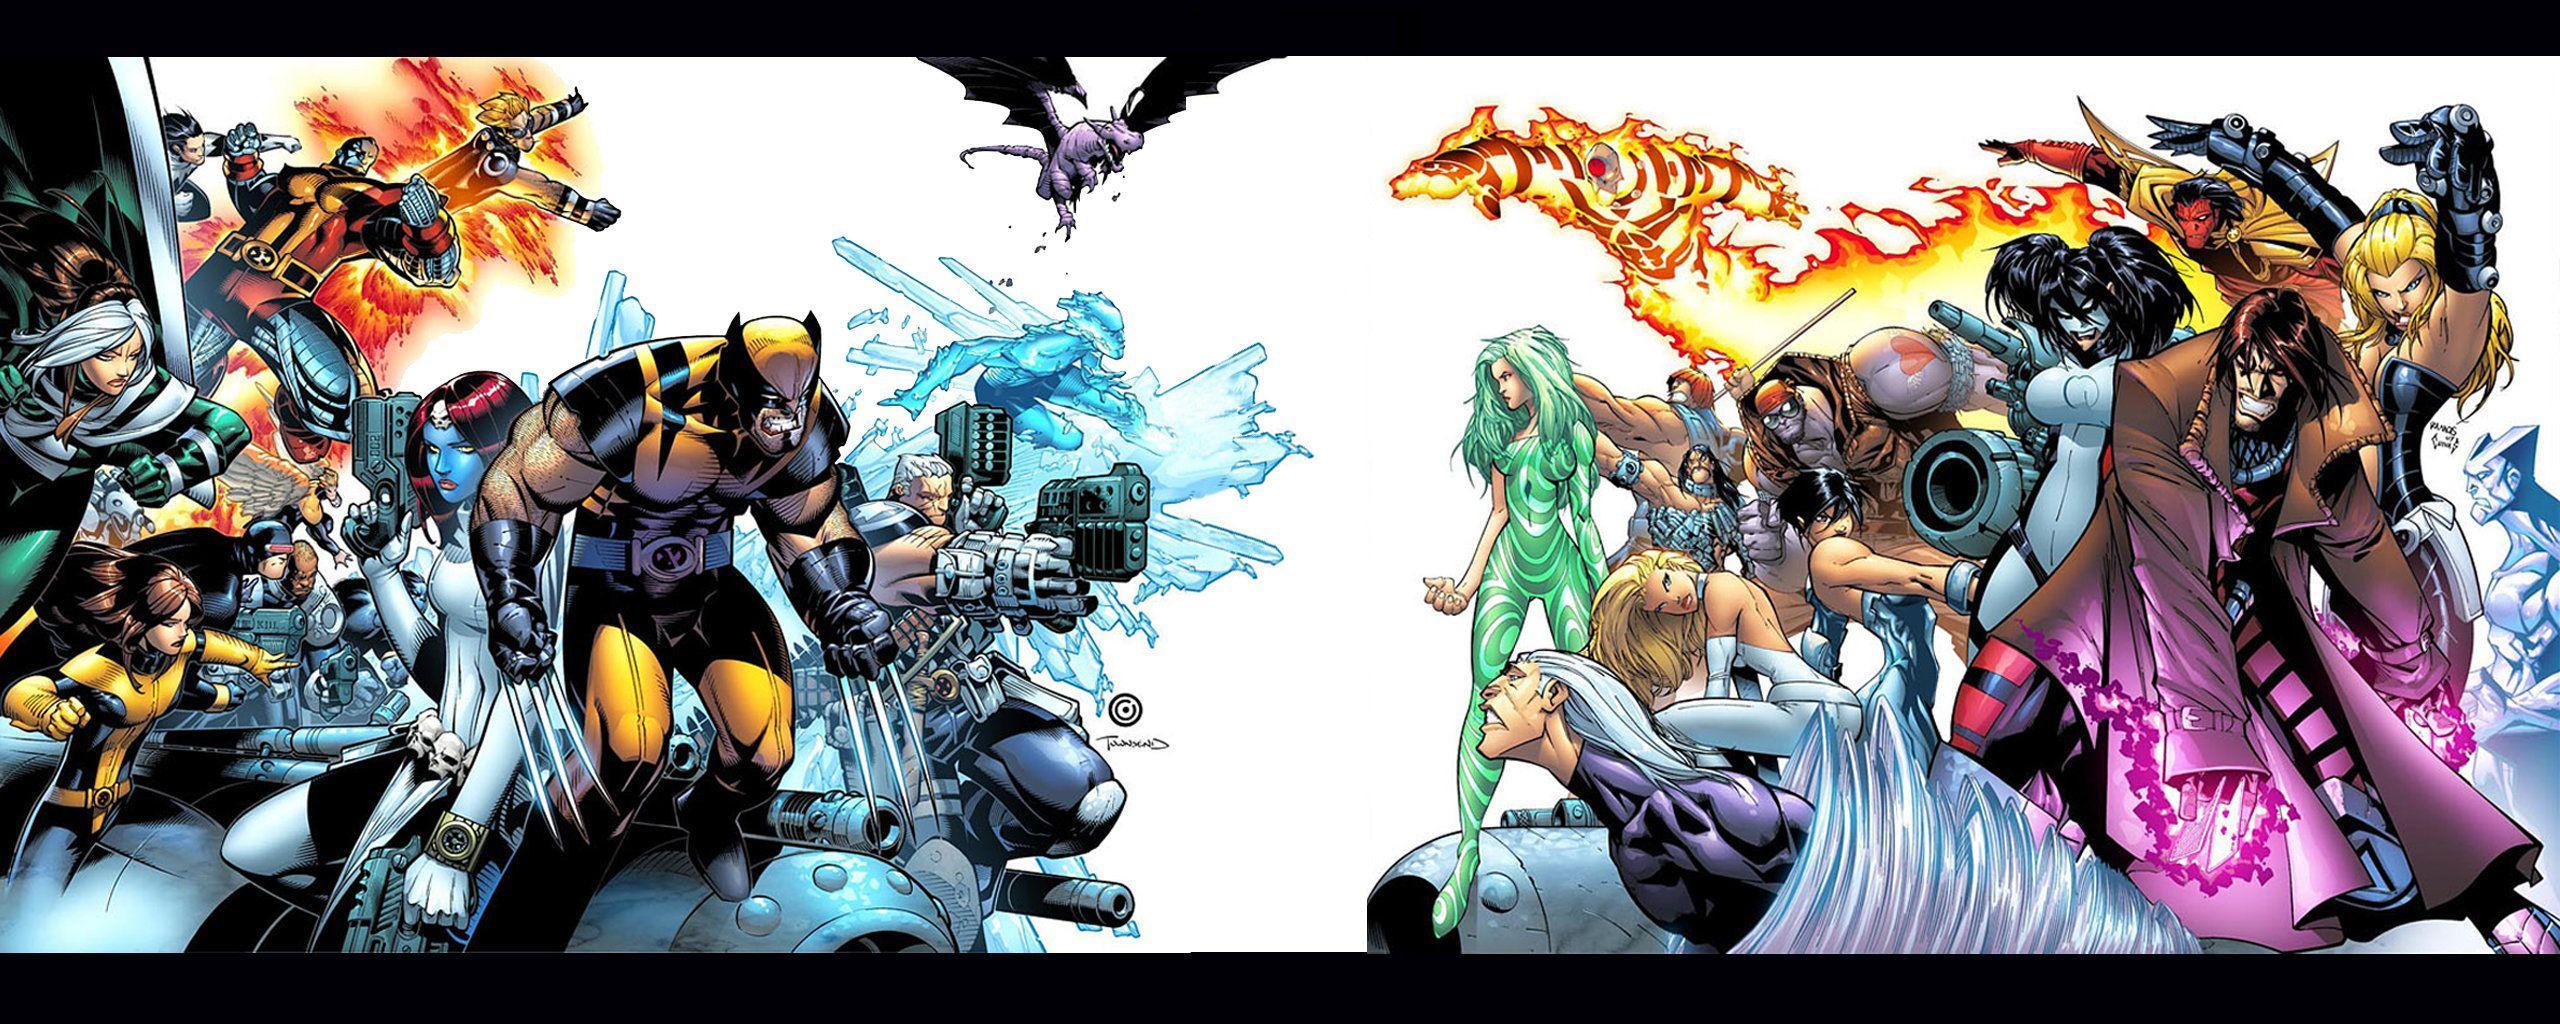 Superhero Dual Screen Wallpapers Top Free Superhero Dual